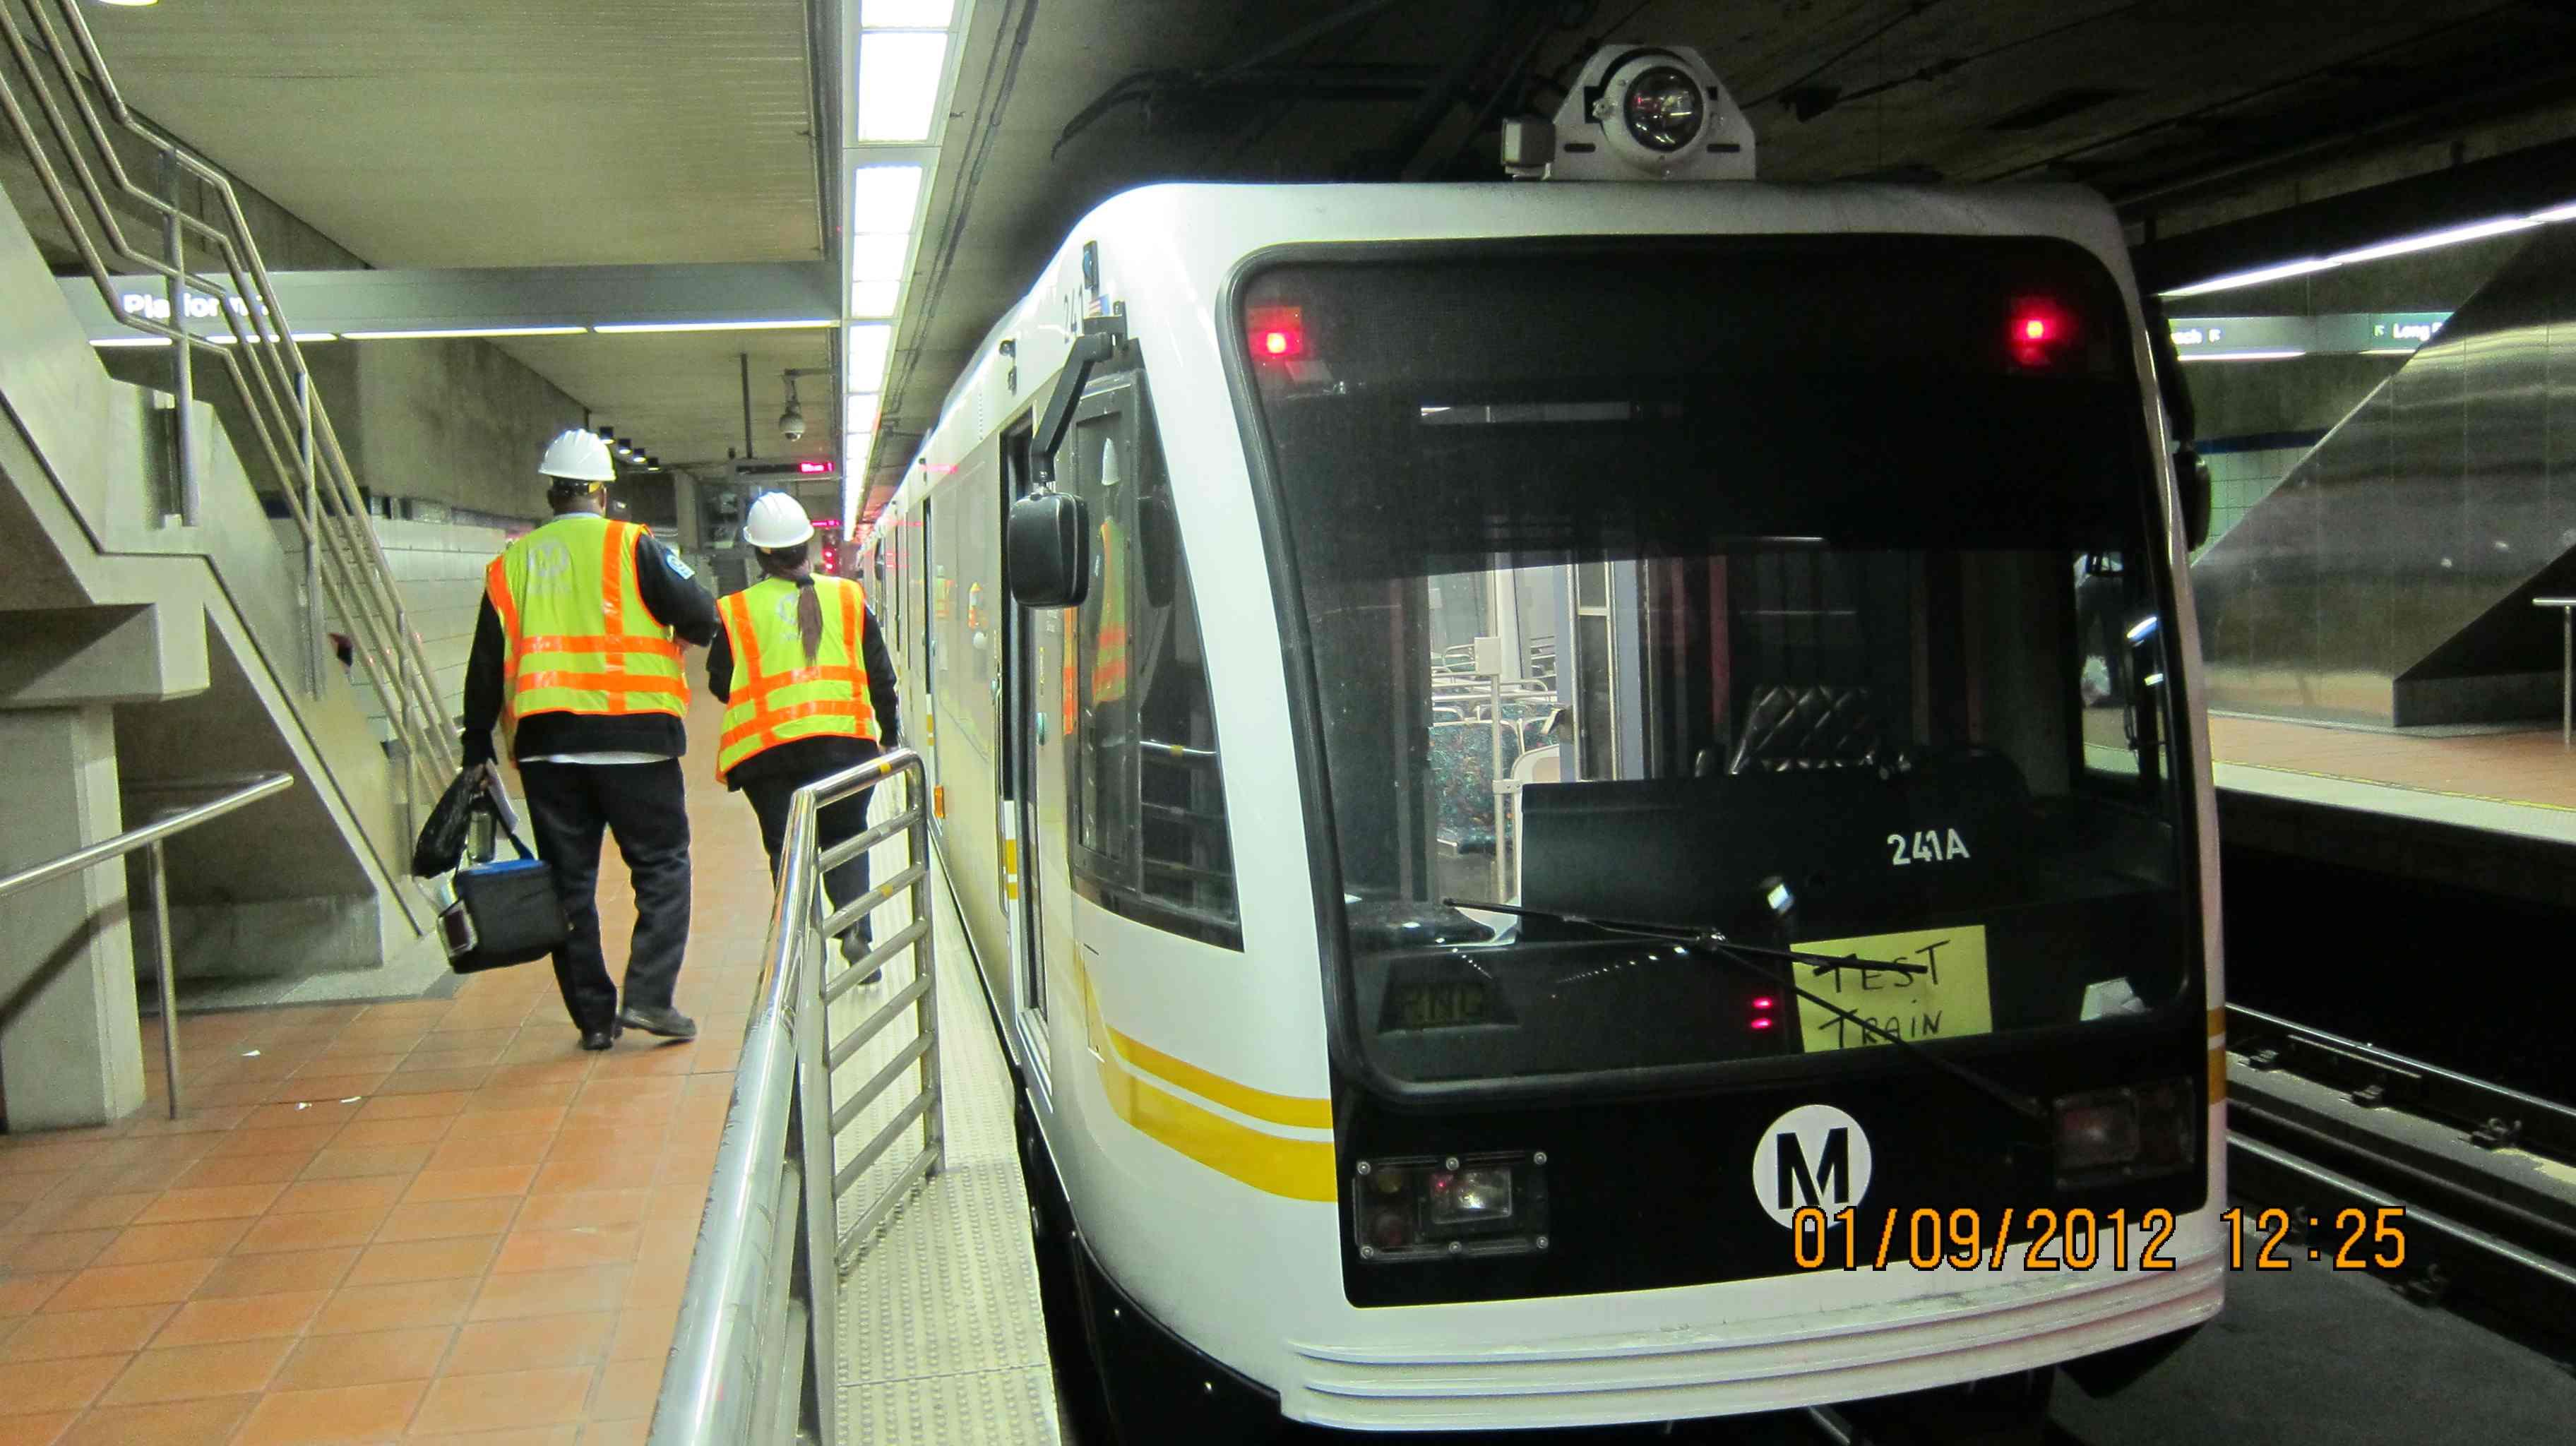 Photo by Luis Inzunza/Metro.